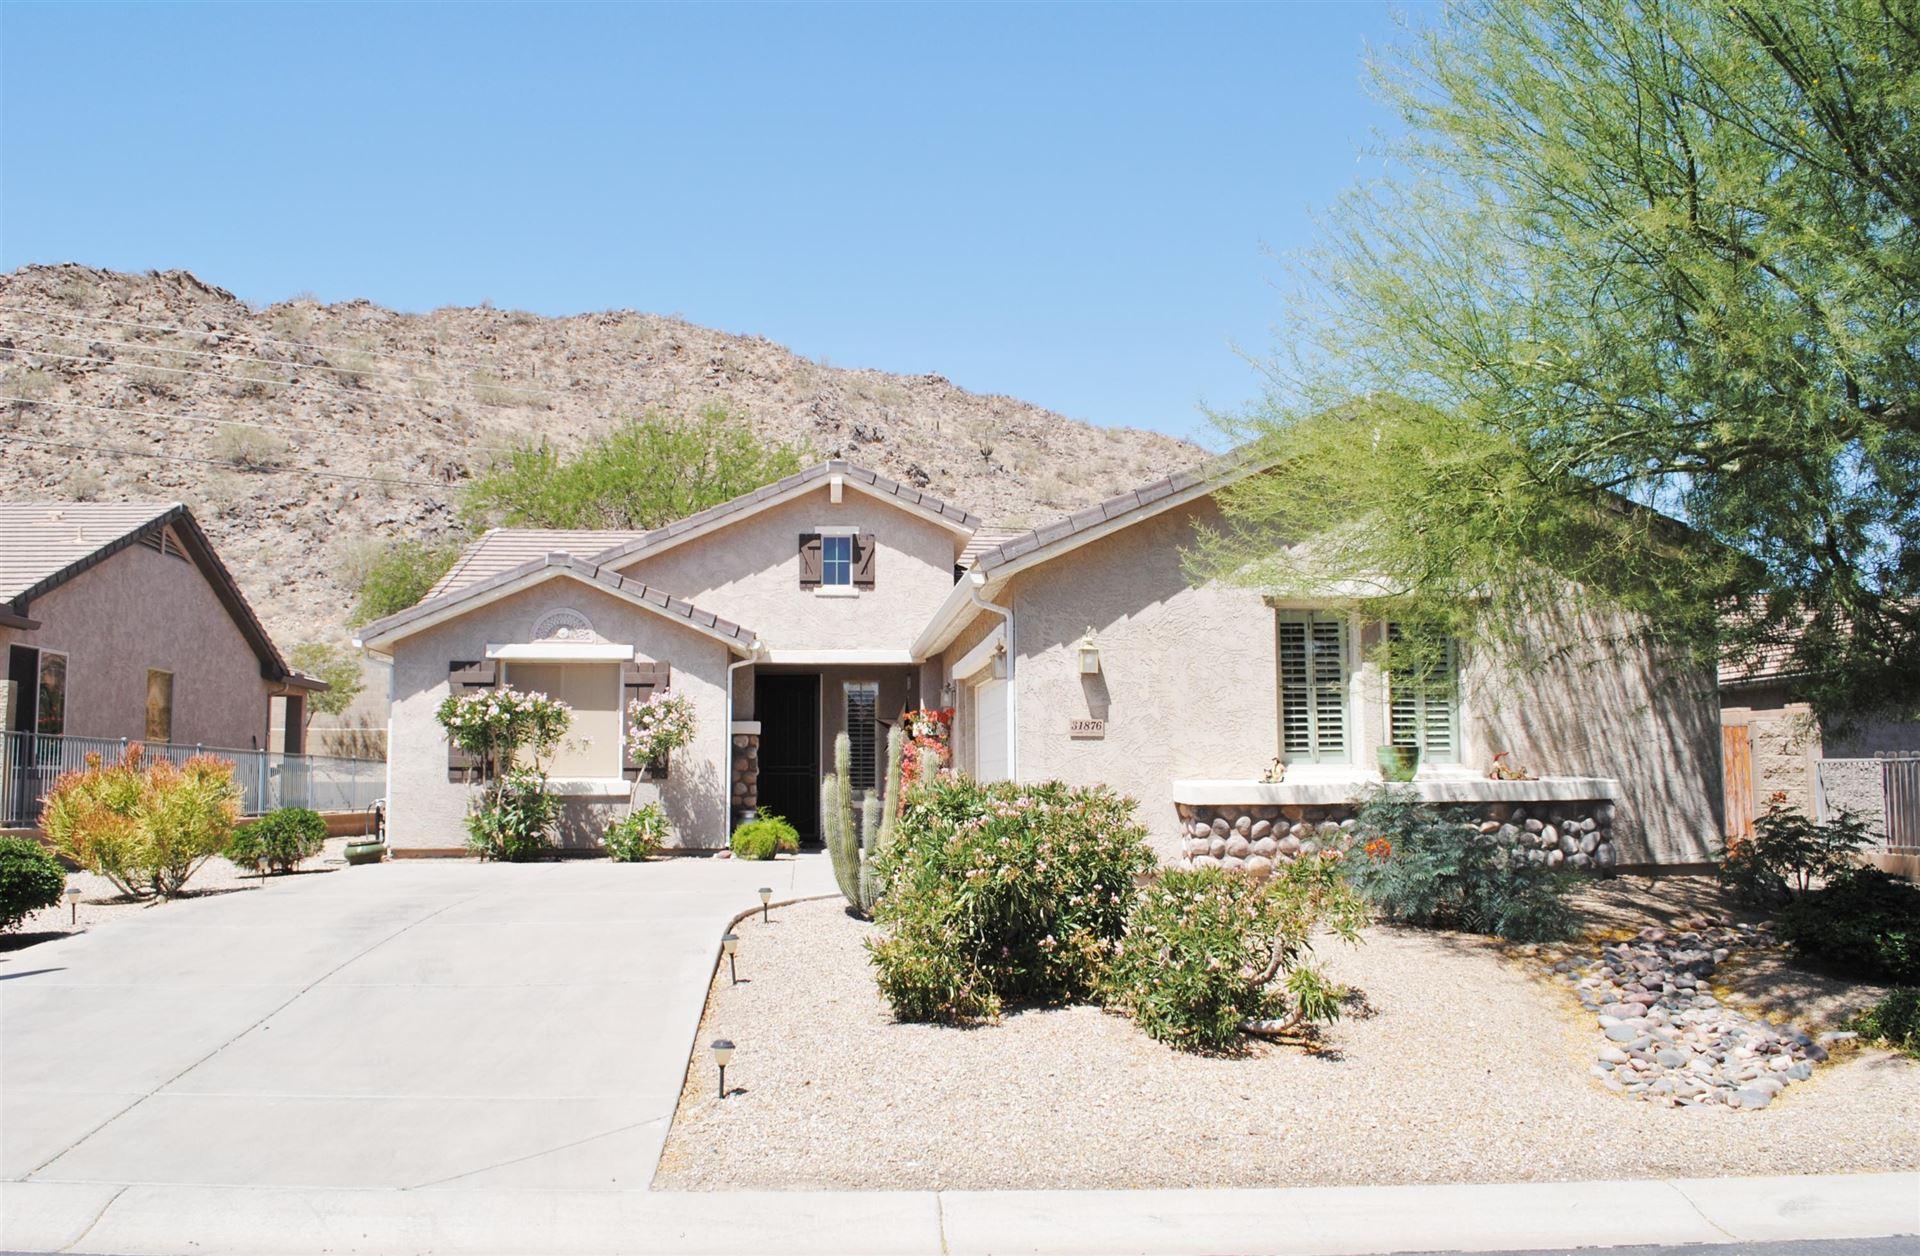 Photo of 31876 N LARKSPUR Drive, San Tan Valley, AZ 85143 (MLS # 6237015)